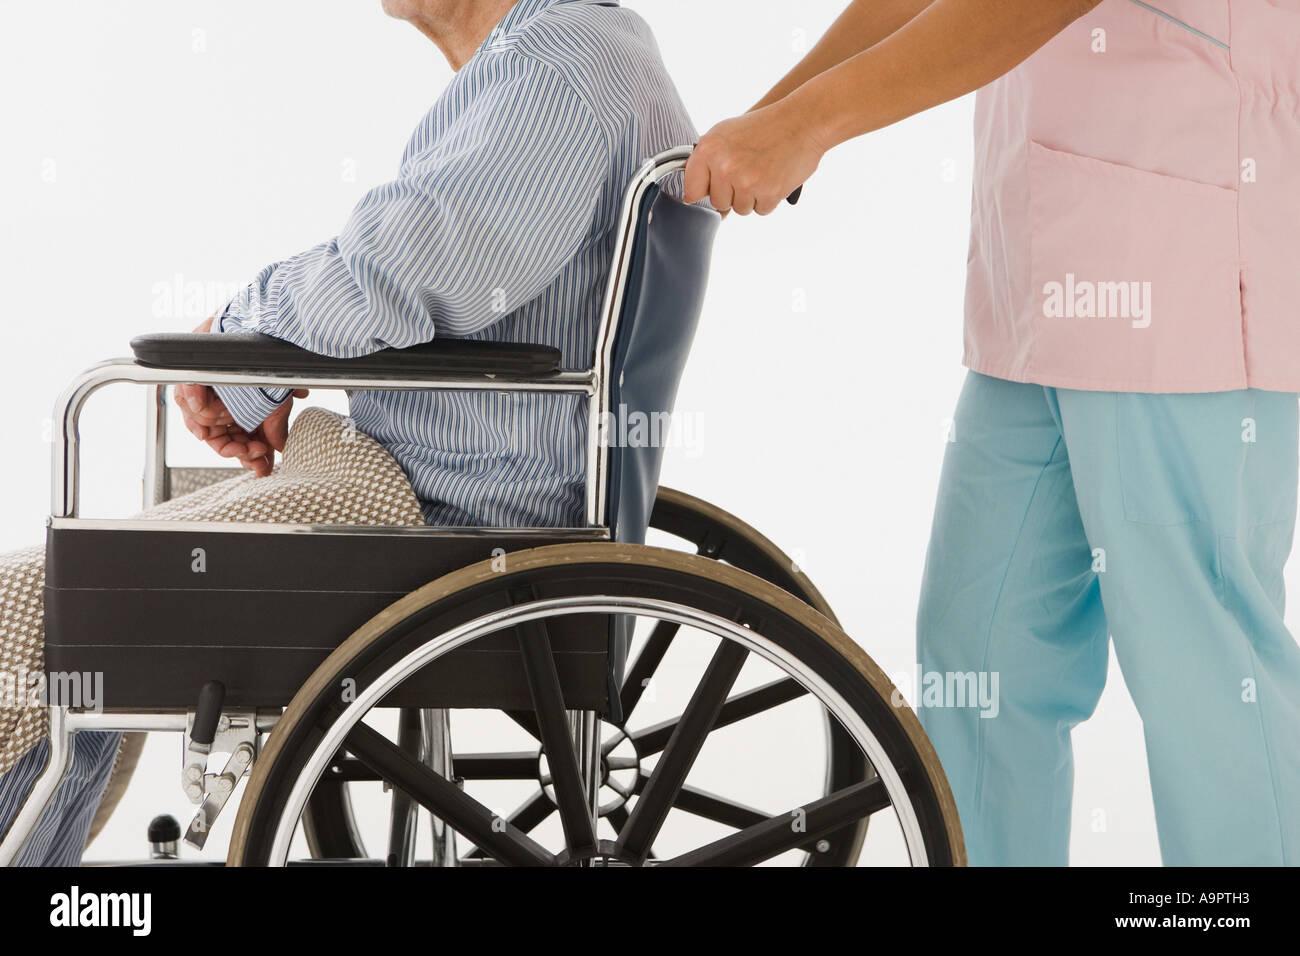 Nurse pushing man in wheelchair Photo Stock